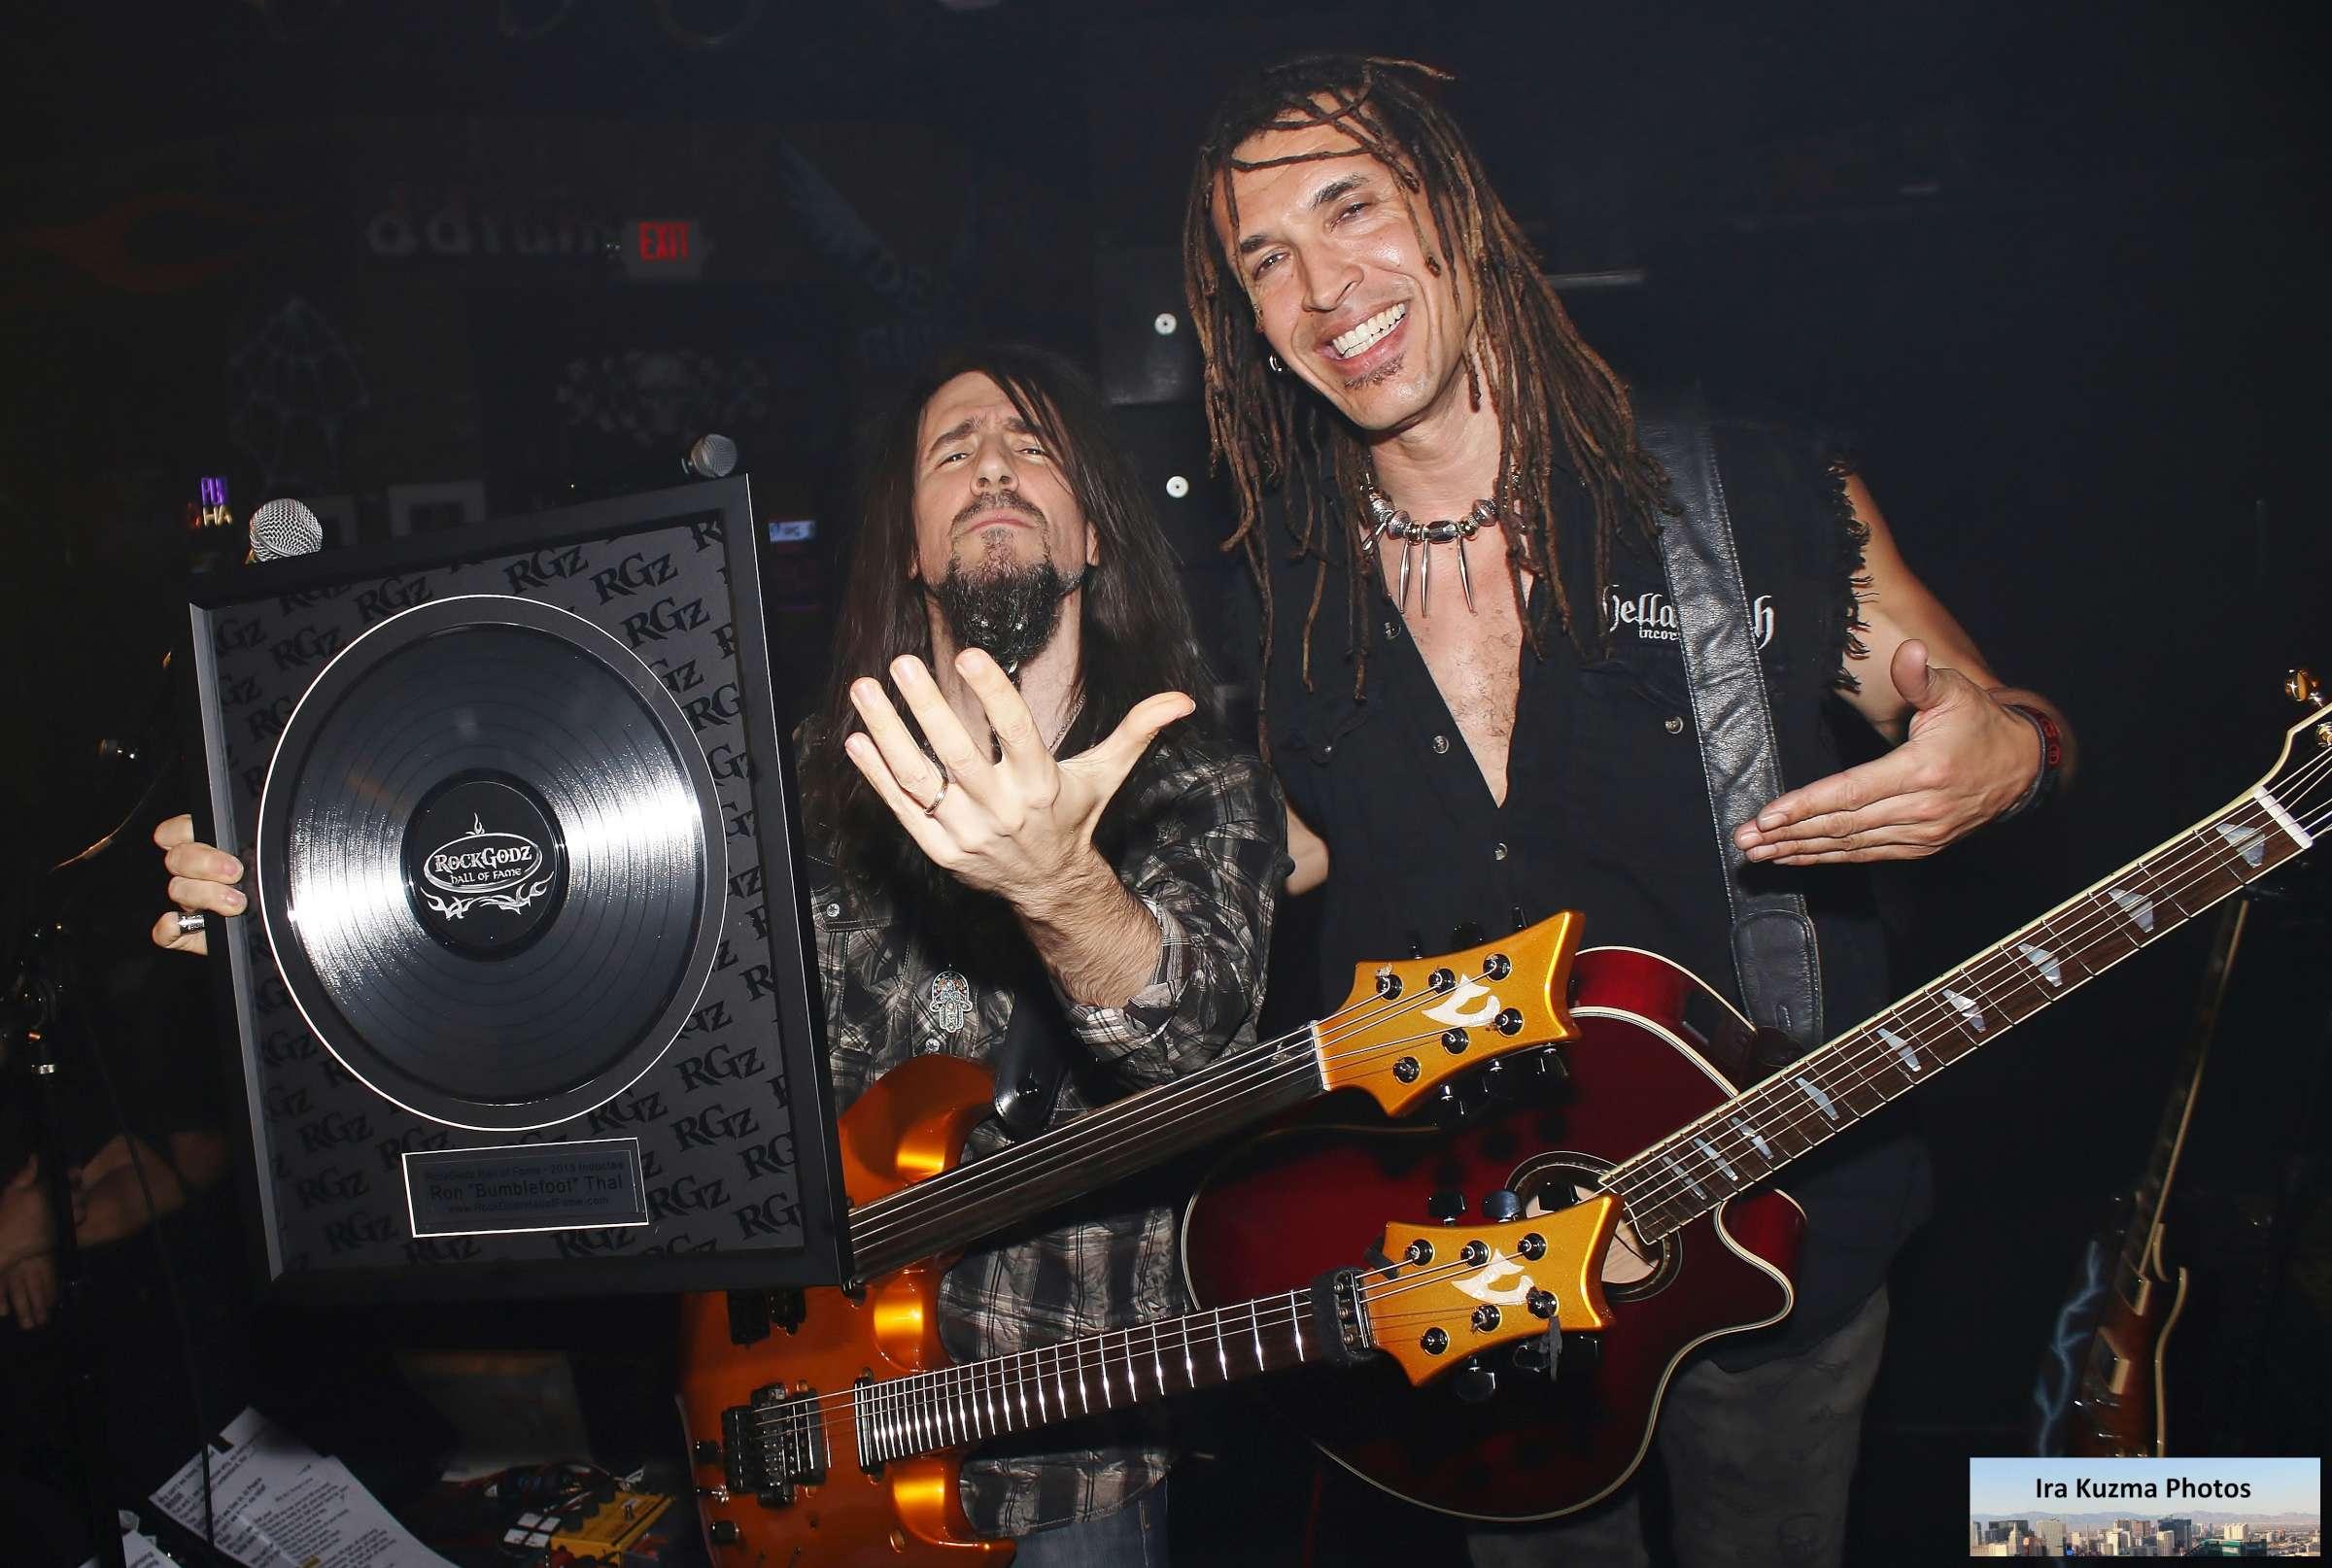 2015-03-25-rock-godz-vampd-0109